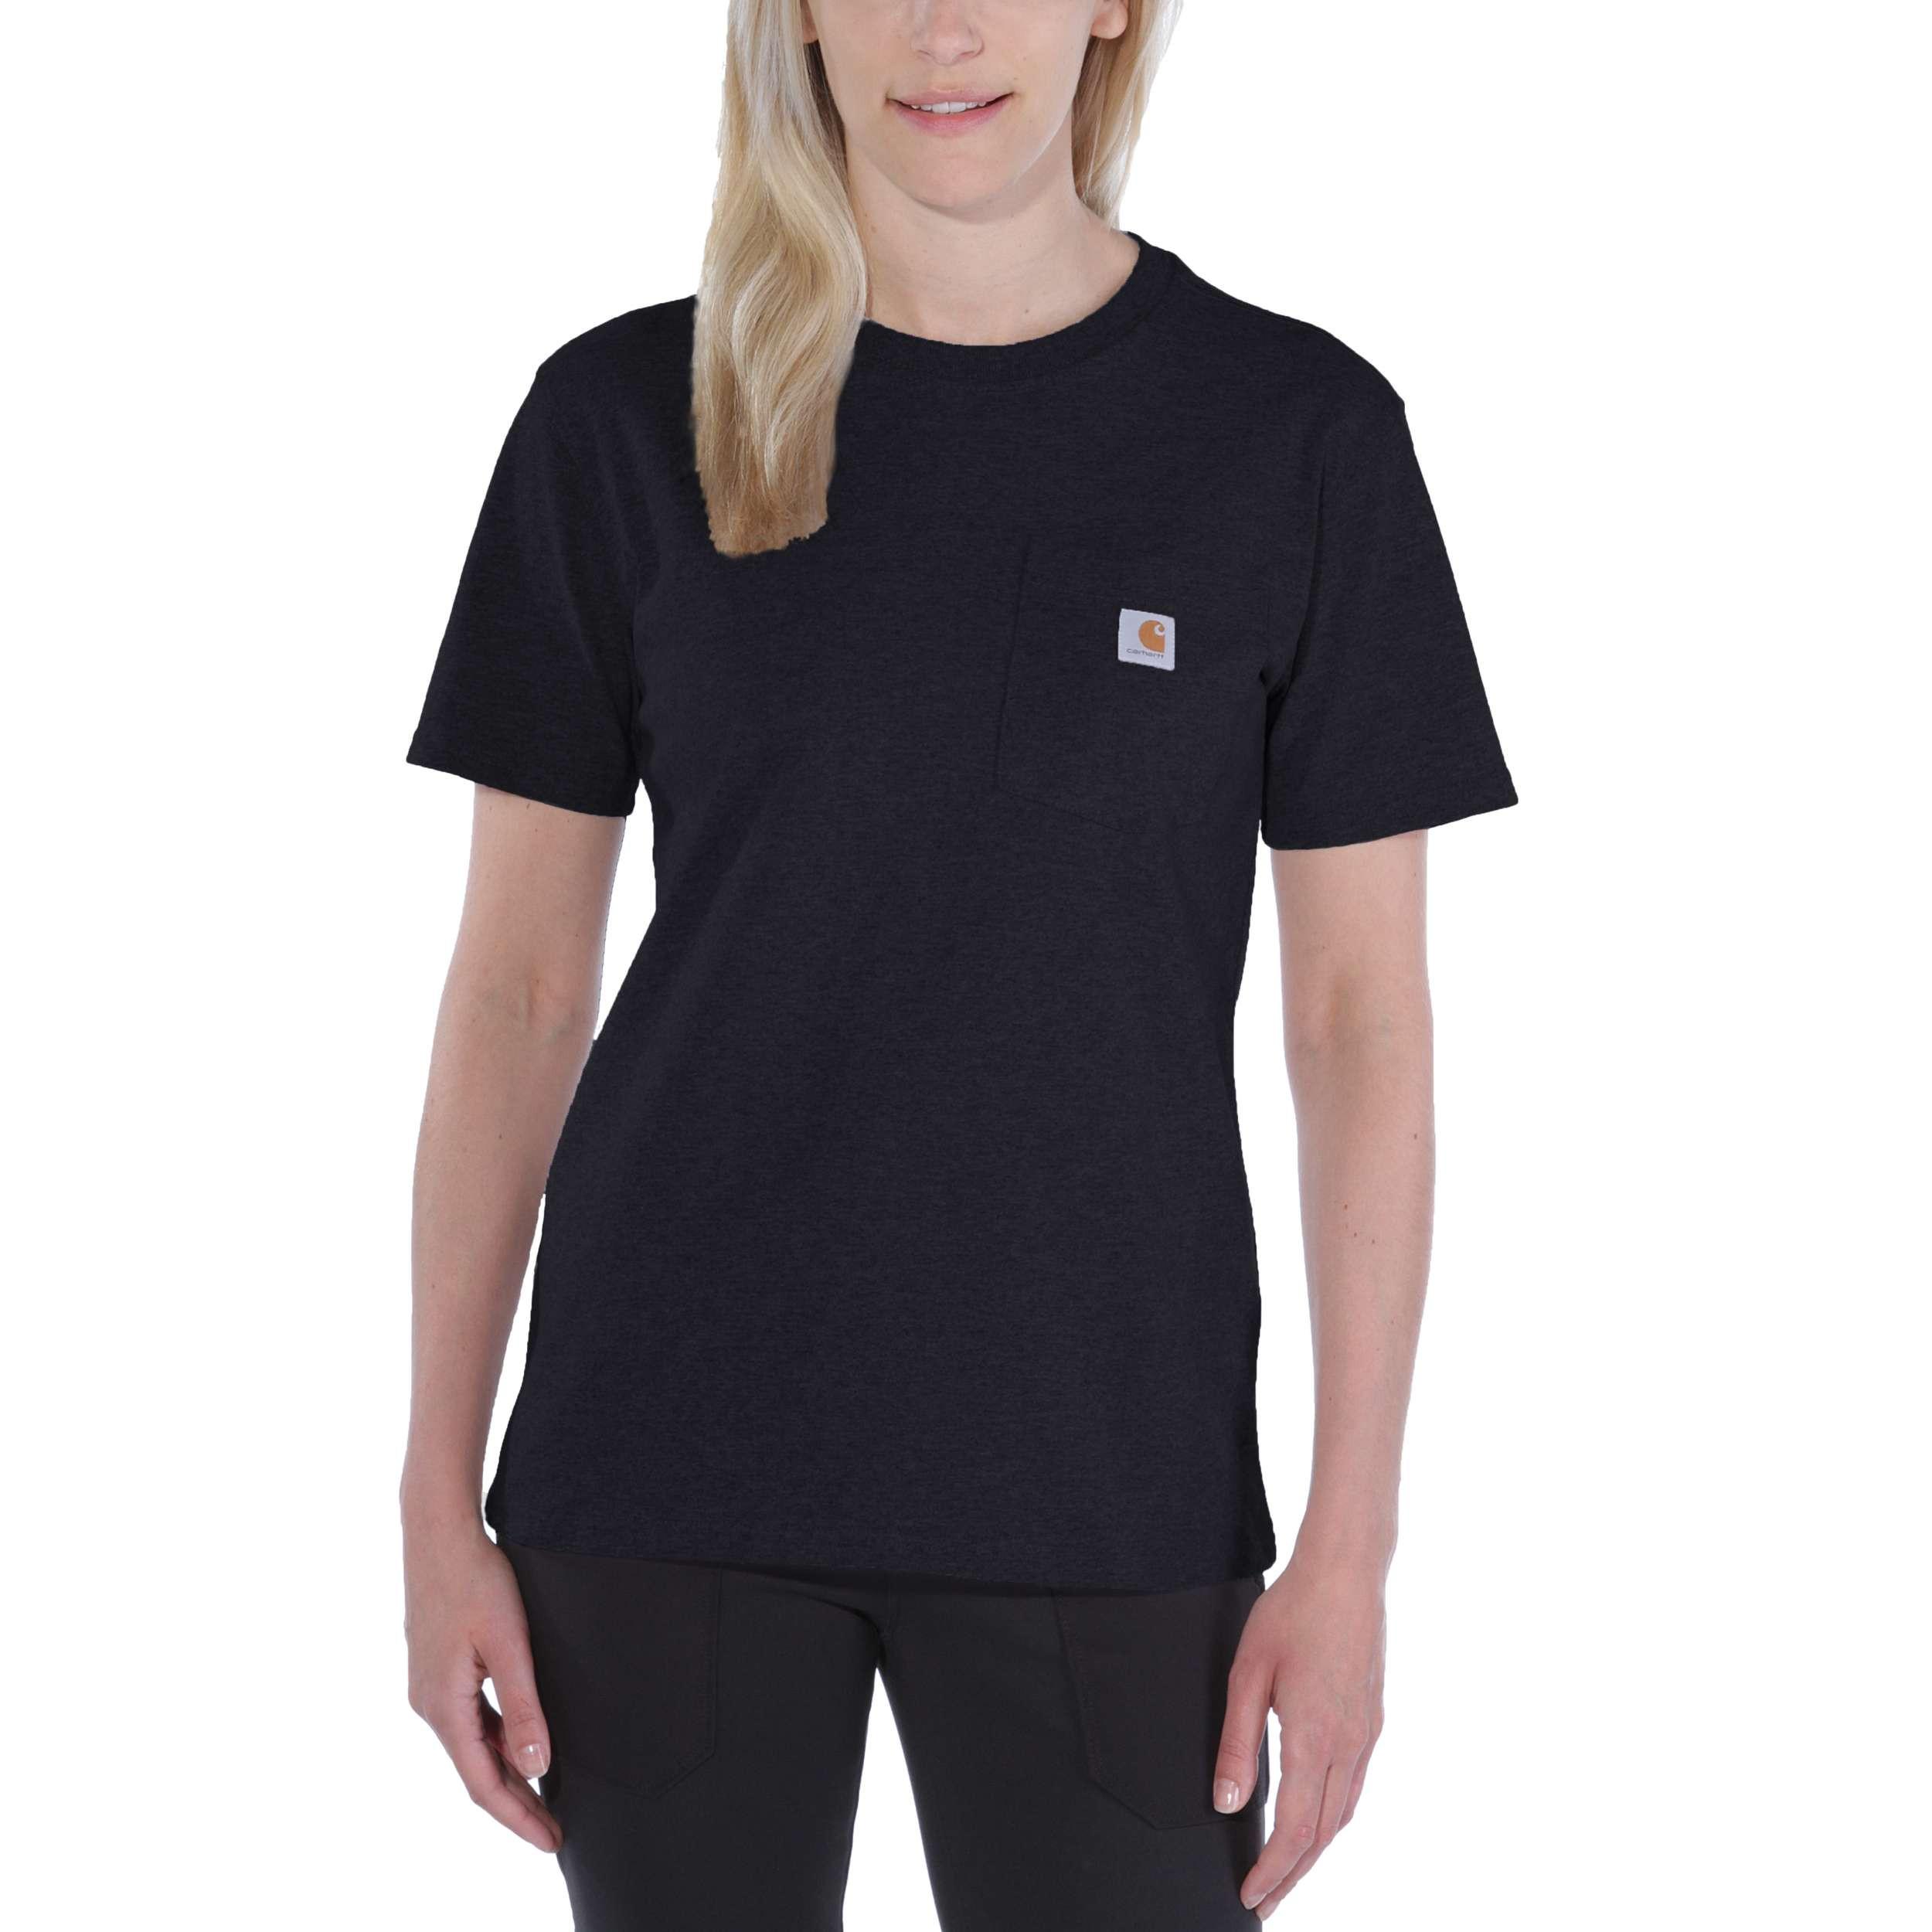 Футболка женская Carhartt WK87 Workwear Pocket T-Shirt - 103067 (Black, XS)